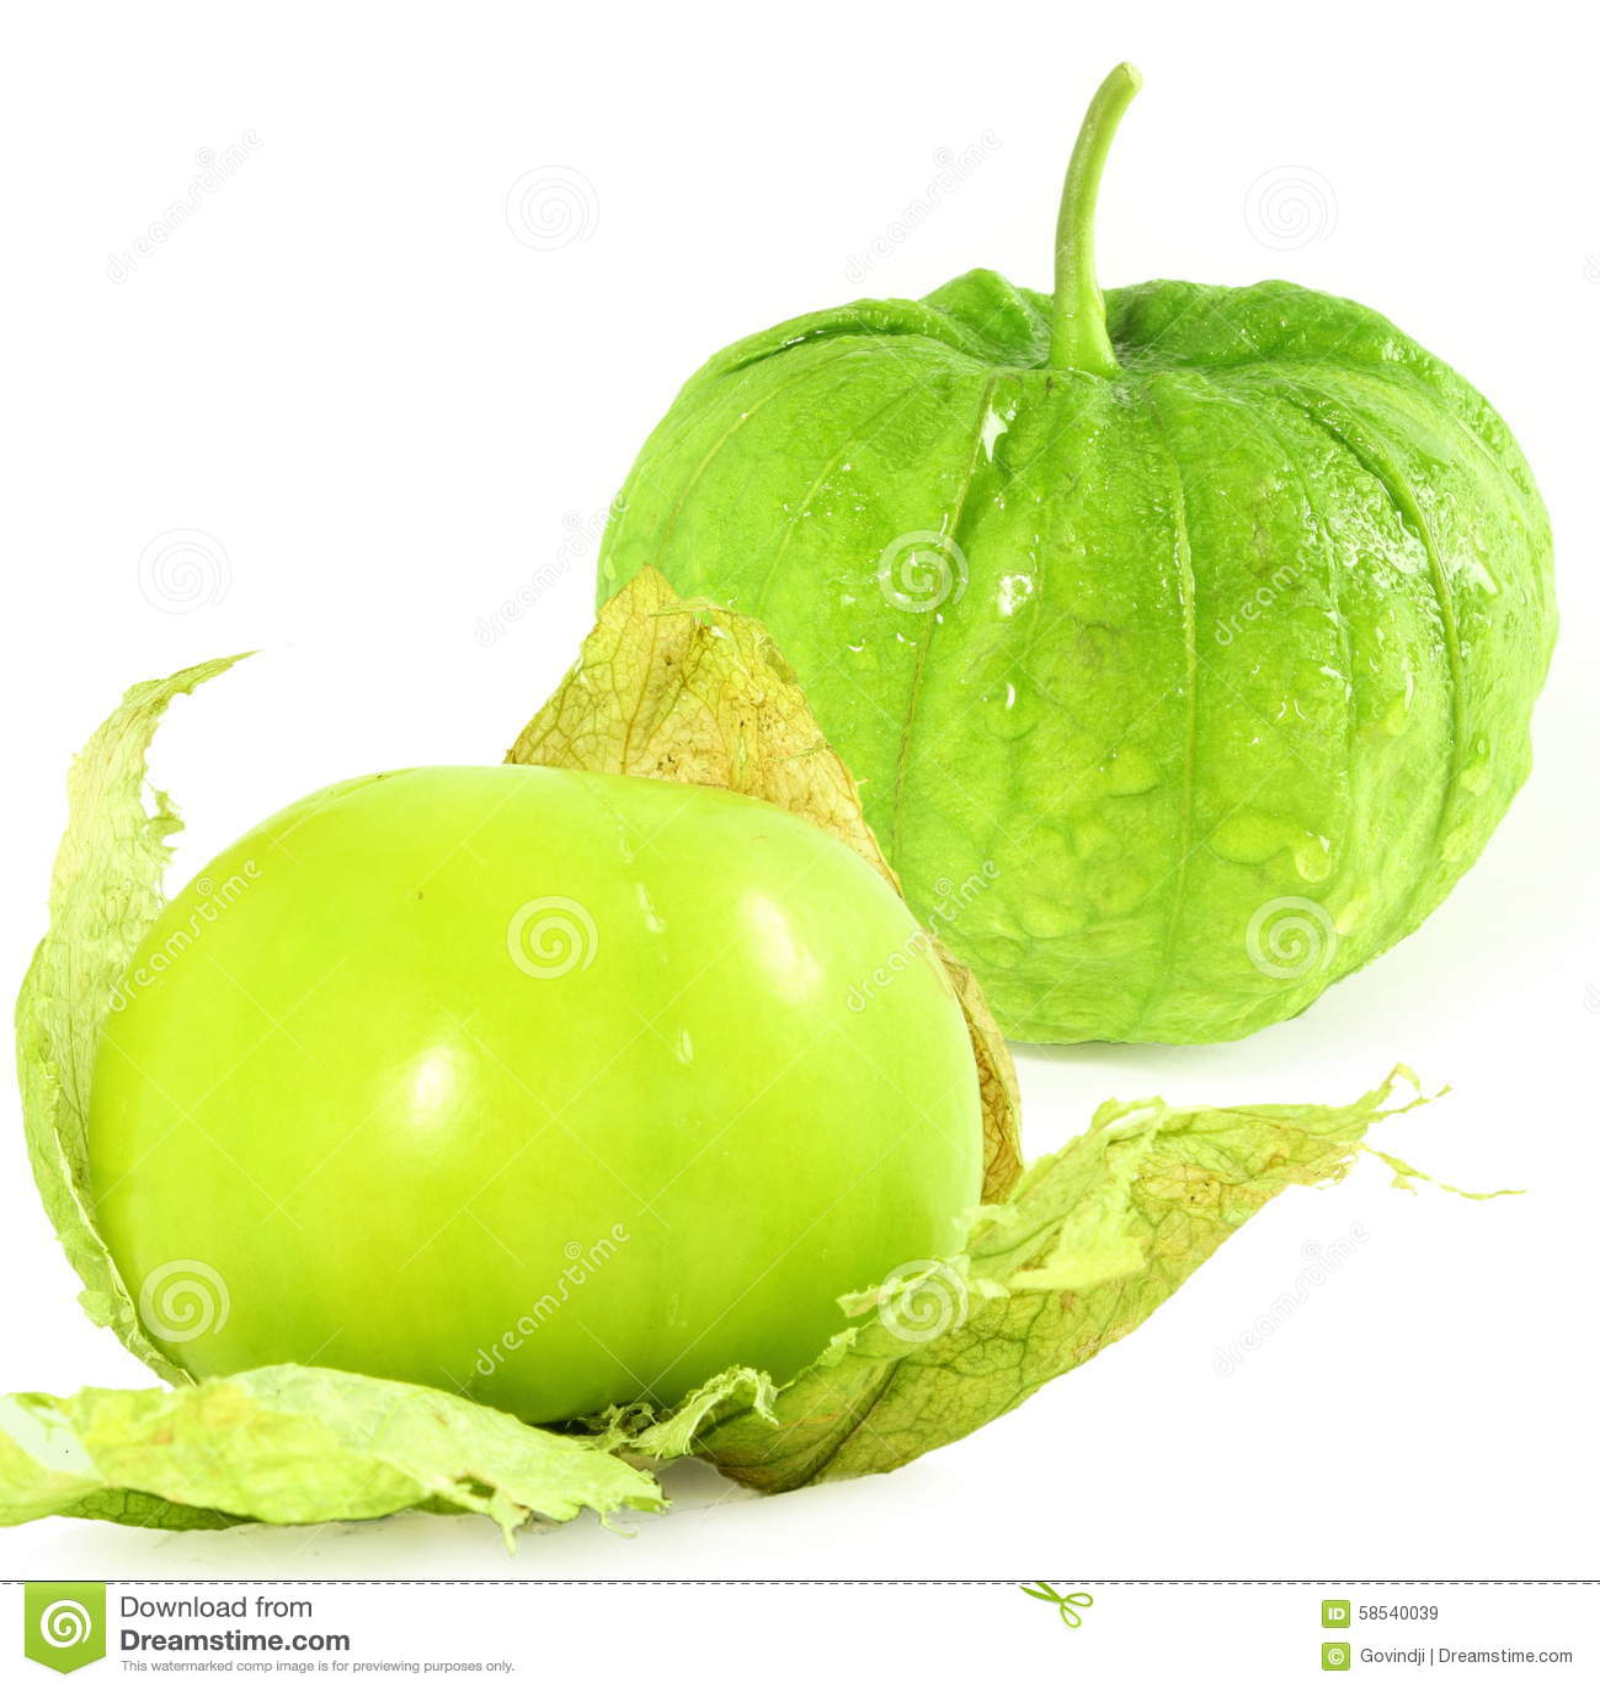 tomatillo ou fruit ou l gume vert mexicain de tomate image stock image du mexicain hybride. Black Bedroom Furniture Sets. Home Design Ideas